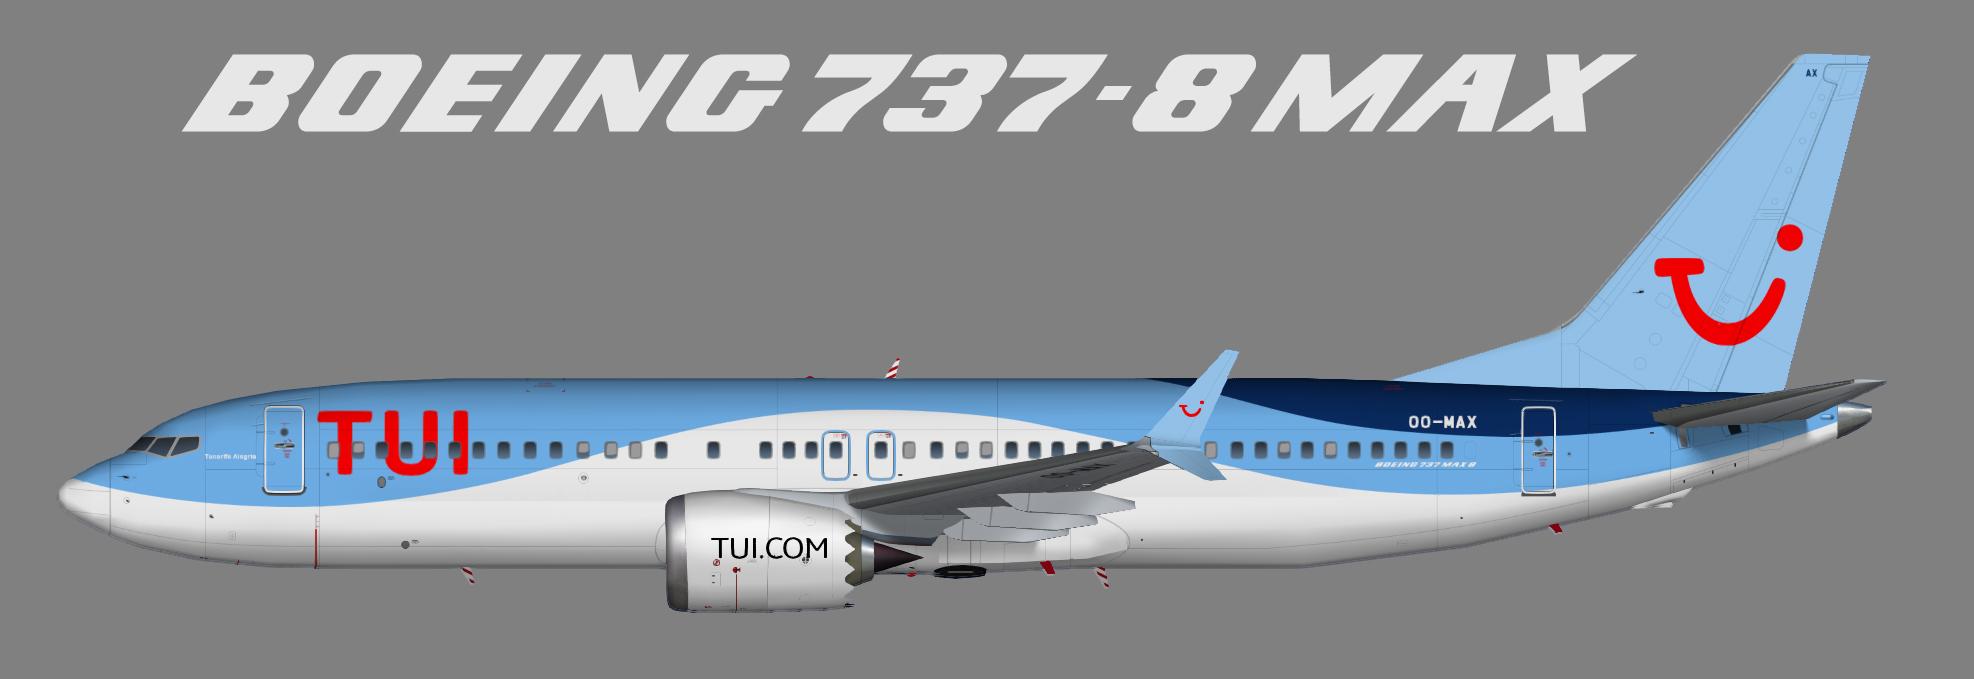 Tui Airlines Belgium Juergen S Paint Hangar